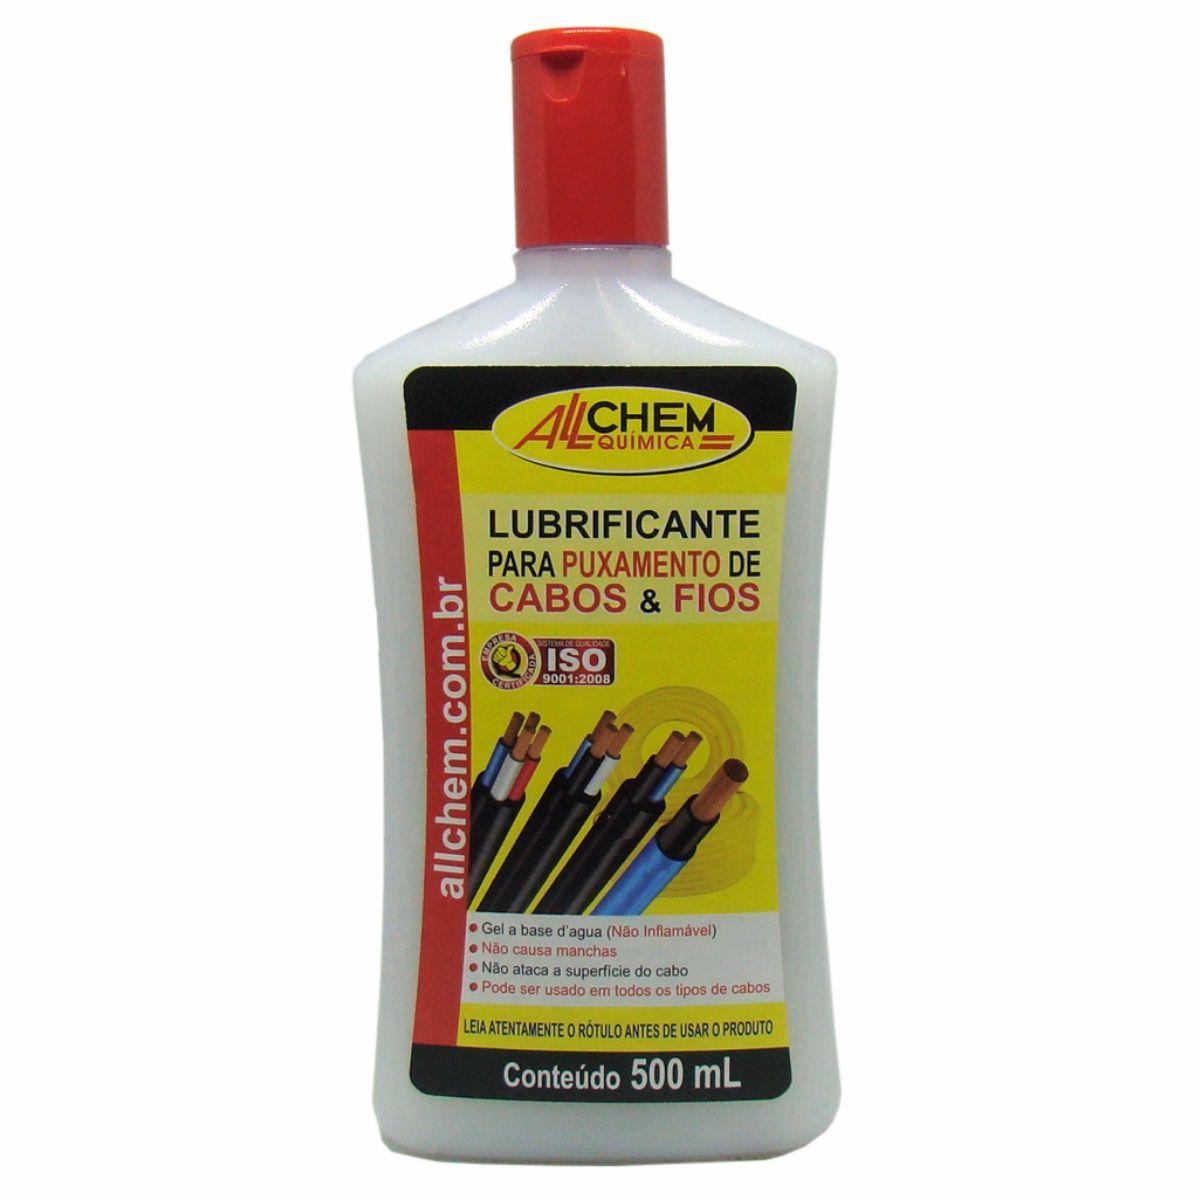 lubrificante-puxamento-cabos-e-fios-allchem